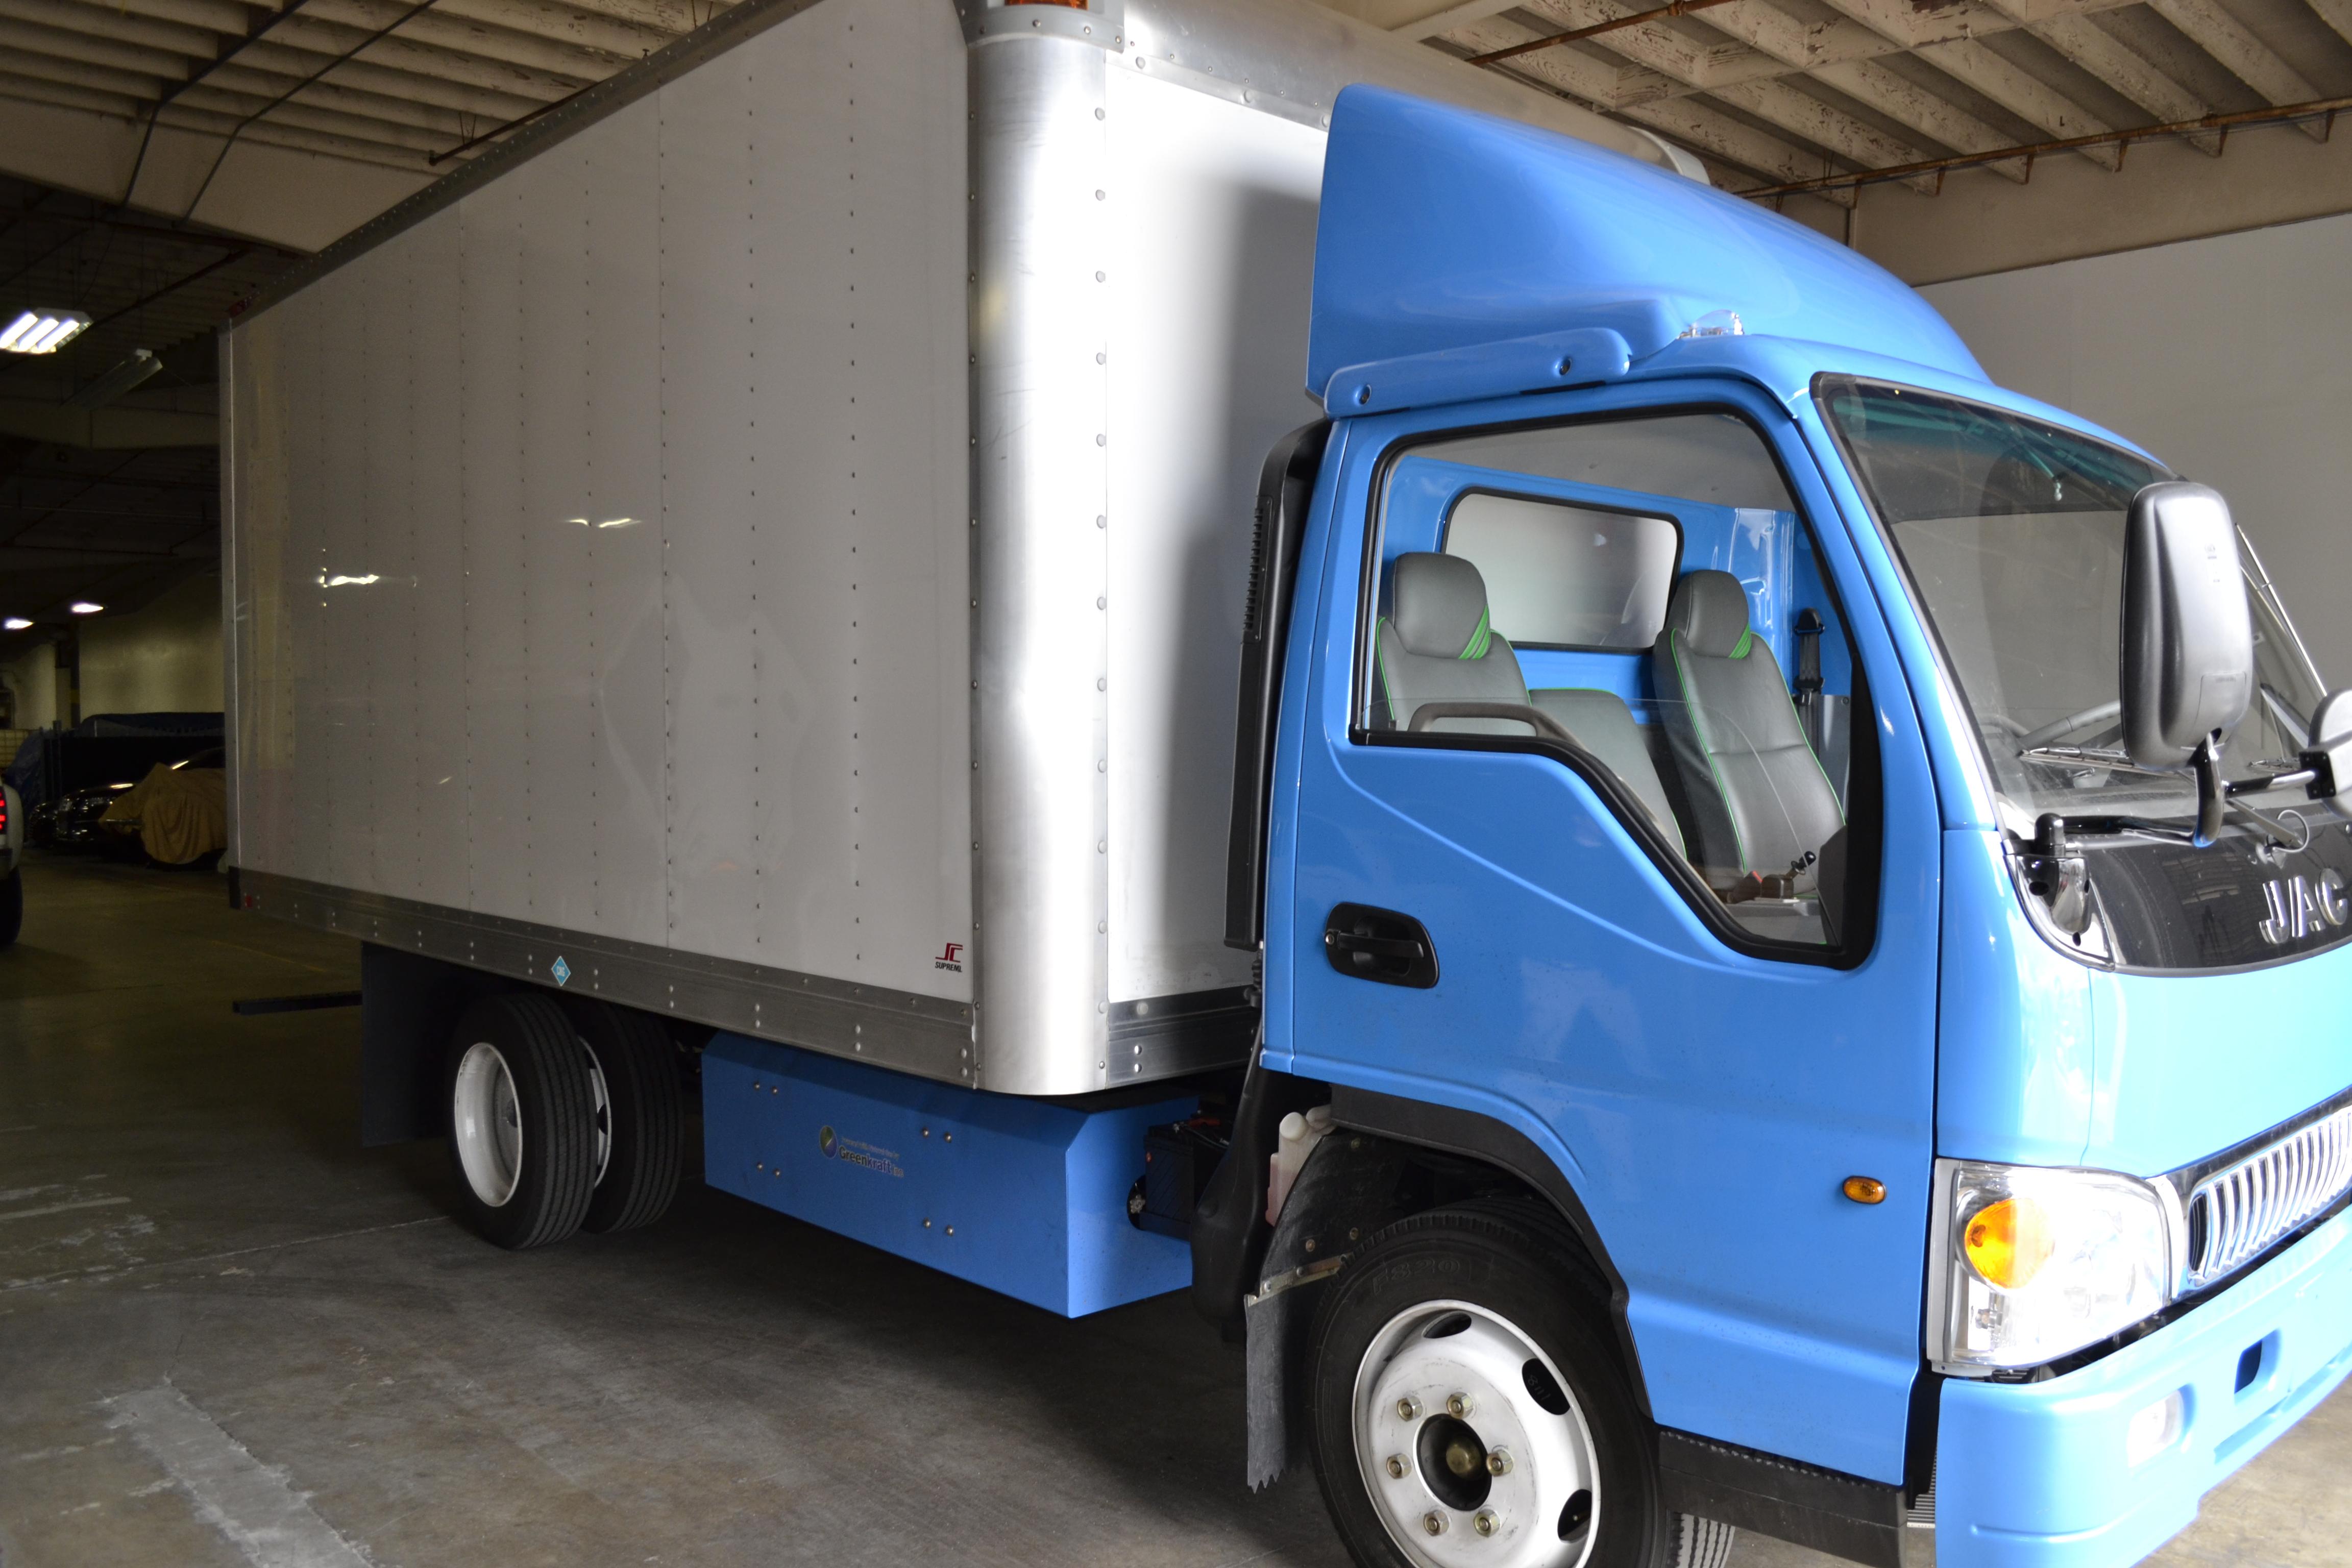 'Work Truck' Takes a Tour of Greenkraft Inc